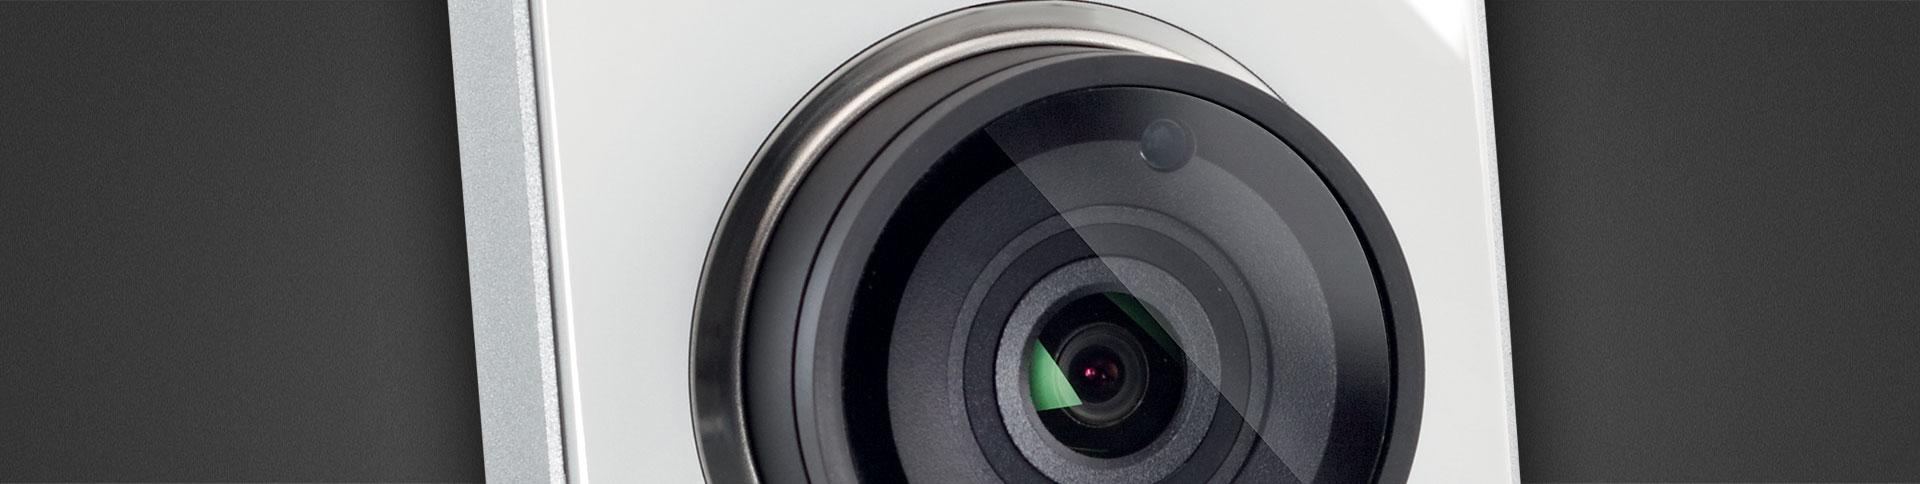 Caméra de vidéosurveillance Diagral plug & play